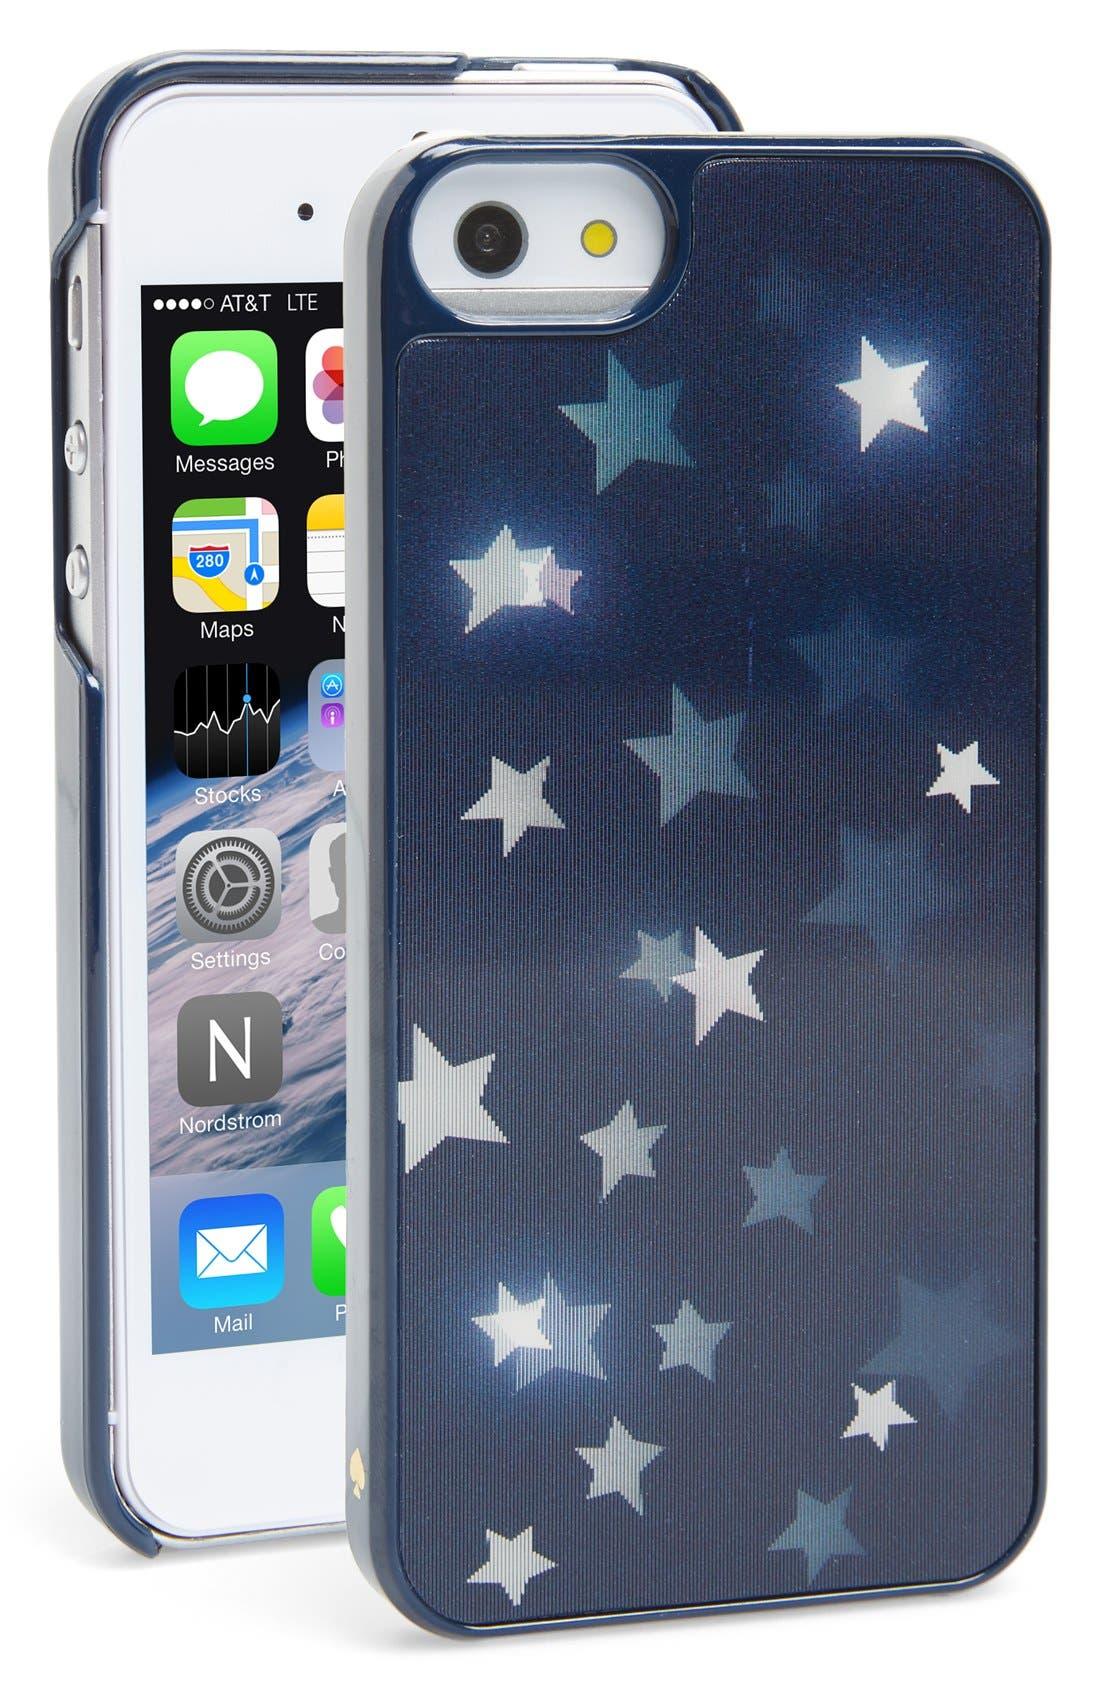 Alternate Image 1 Selected - kate spade new york 'night sky' iPhone 5 & 5s case